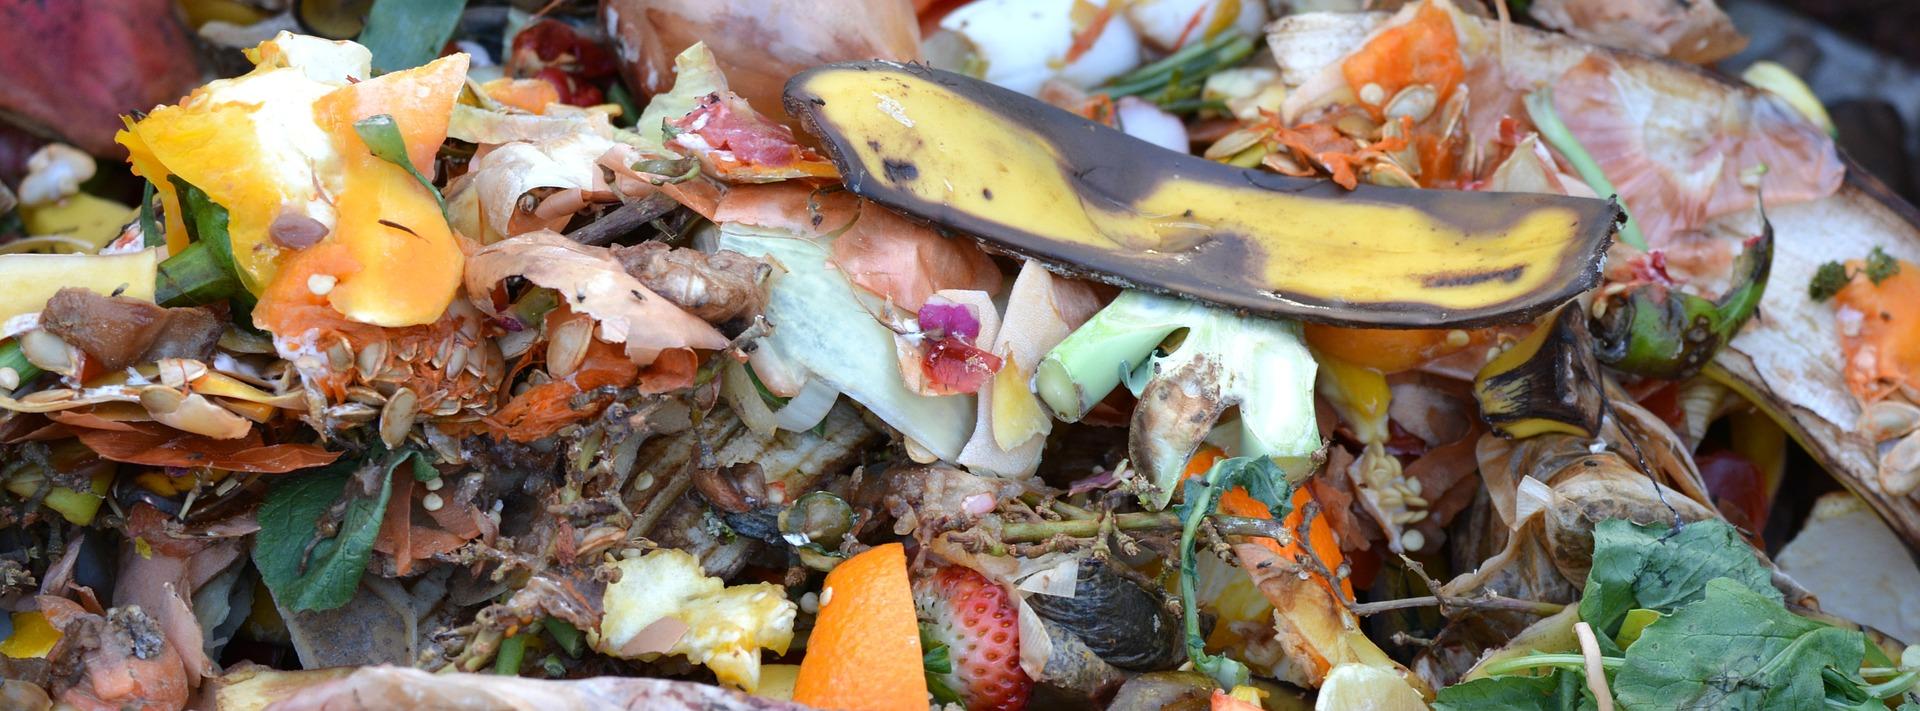 compost-709020_1920 copy.jpg